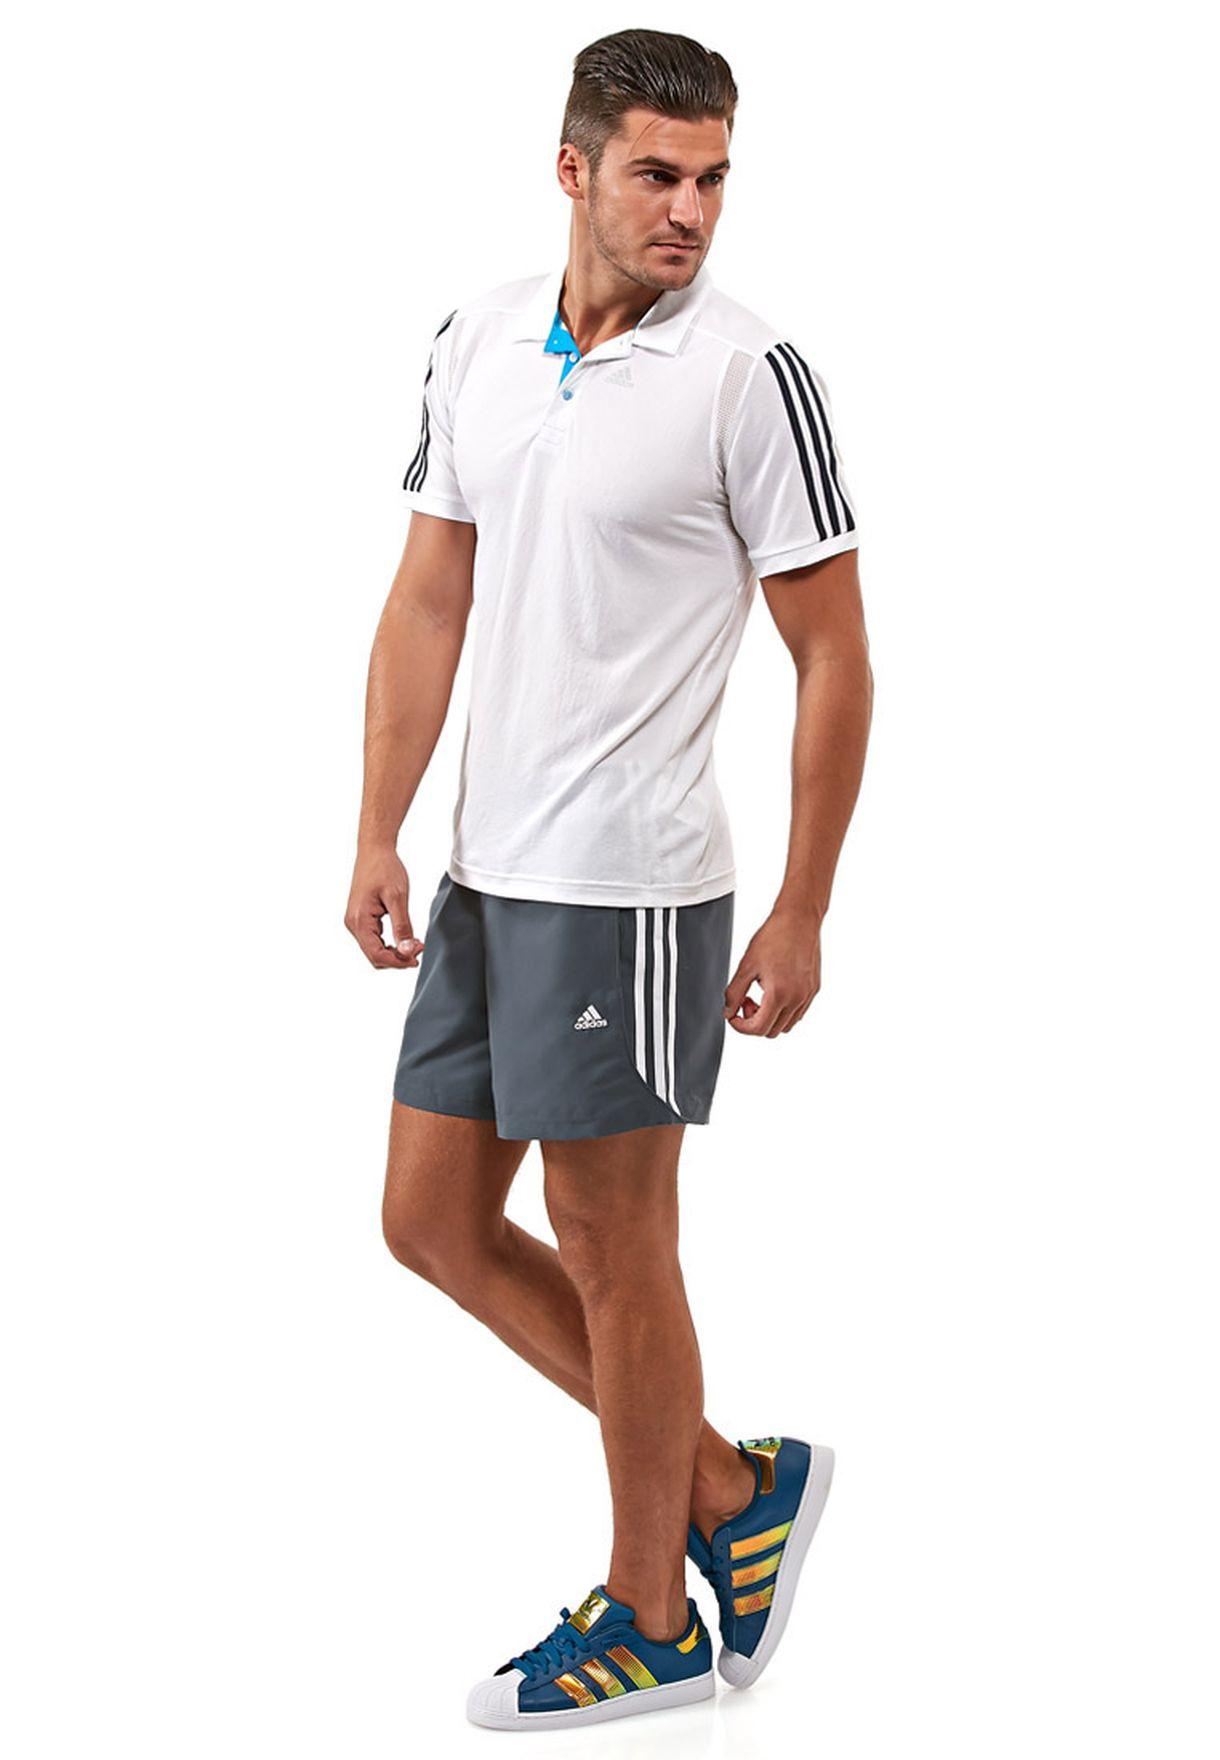 wholesale dealer 2e29d 3e890 Shop adidas grey Essential Chelsea Shorts X20185 for Men in Bahrain -  AD476AT89APQ